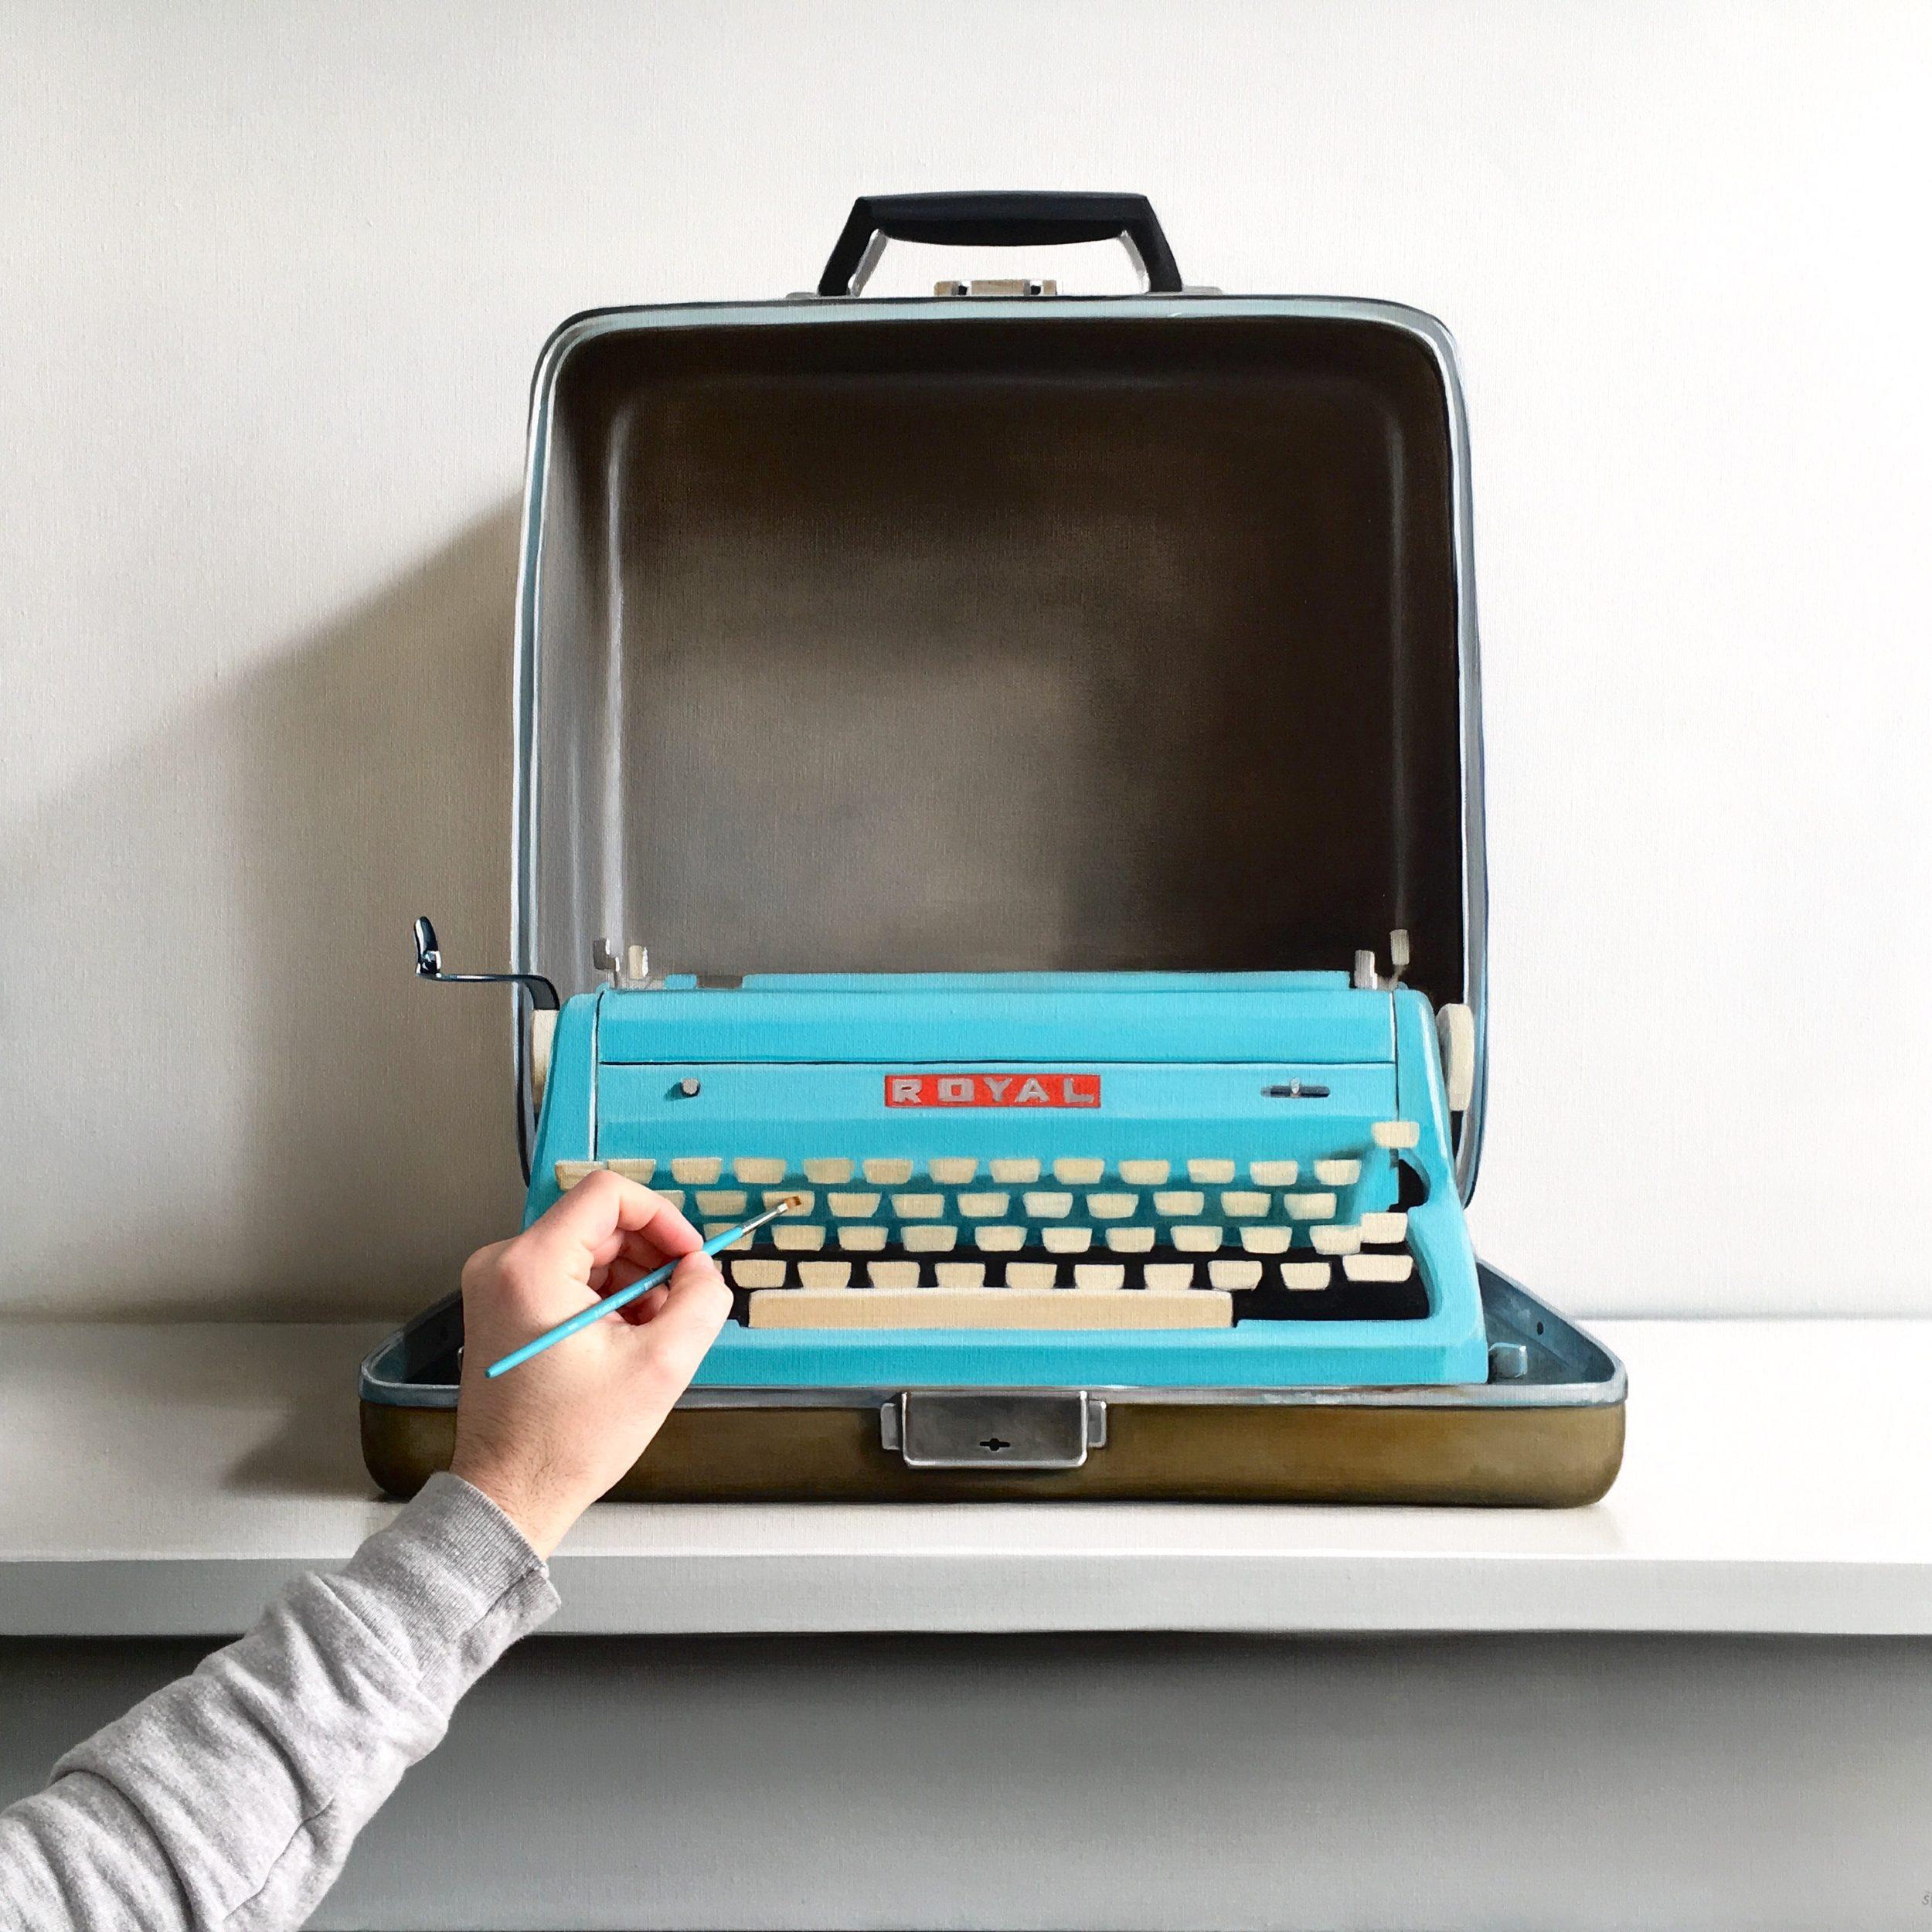 Royal Typewriter / Work in Progress by Christopher Stott